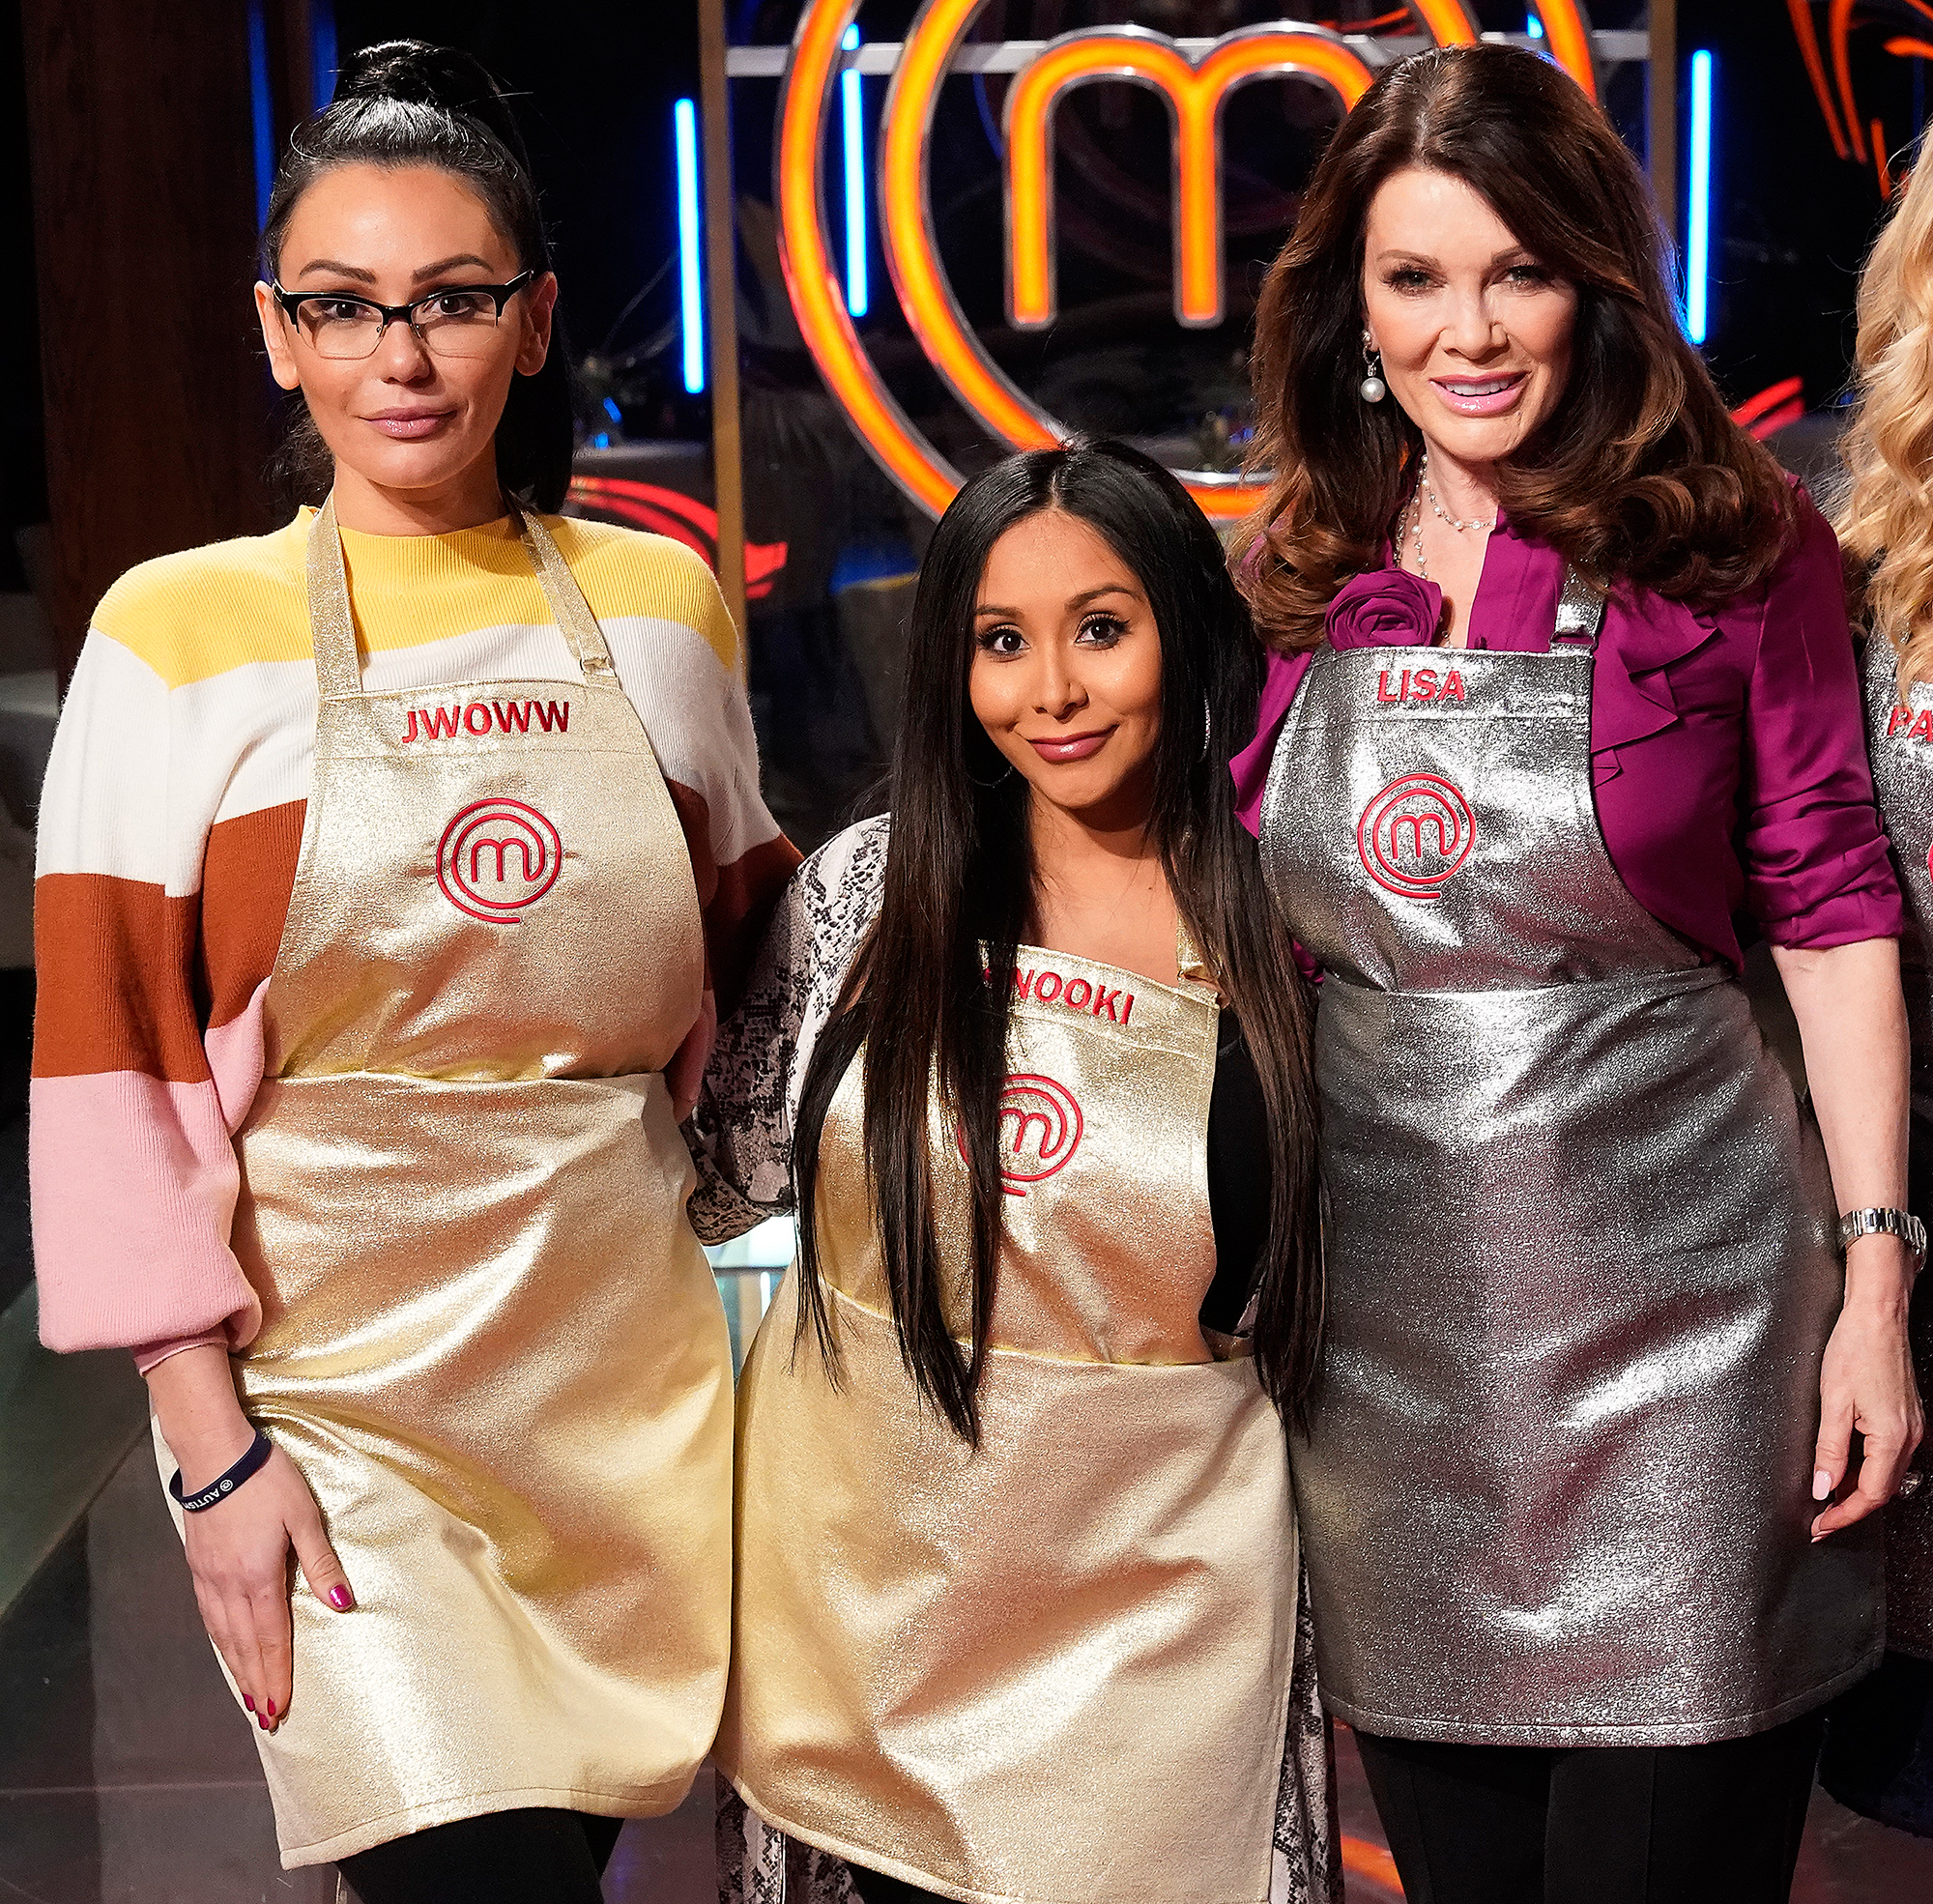 Nicole Snooki Polizzi Jenni JWoww Farley Lisa Vanderpump MasterChef - JWoww, Snooki and Lisa Vanderpump on 'MasterChef.